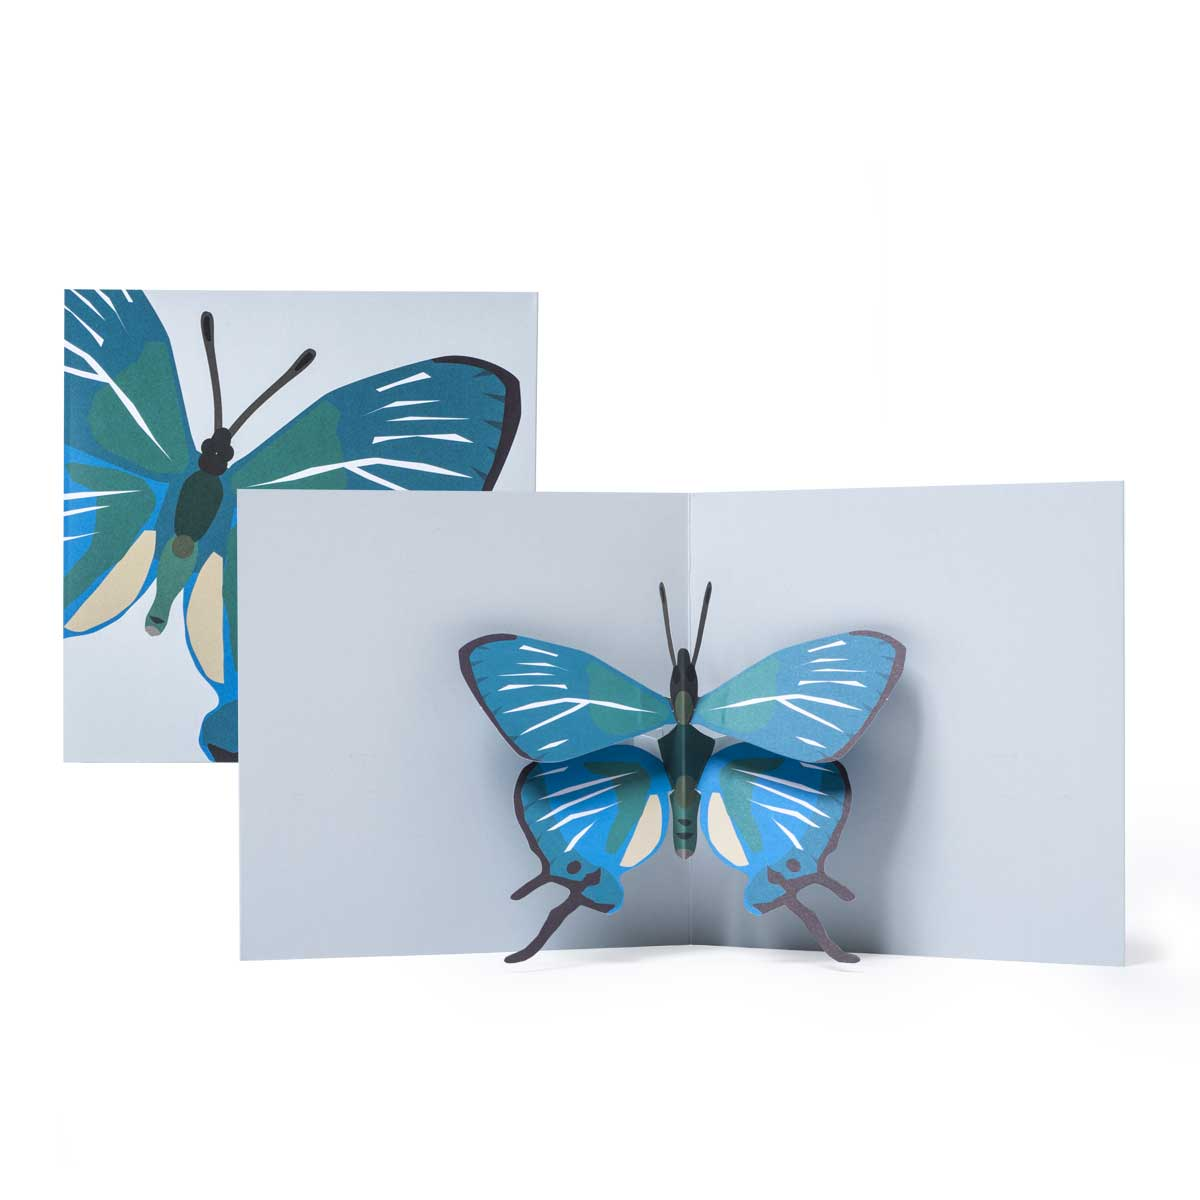 2-to-Tango_Blue-Butterfly-Pop-up-card_MaikeBiederstaedt.jpg.jpg